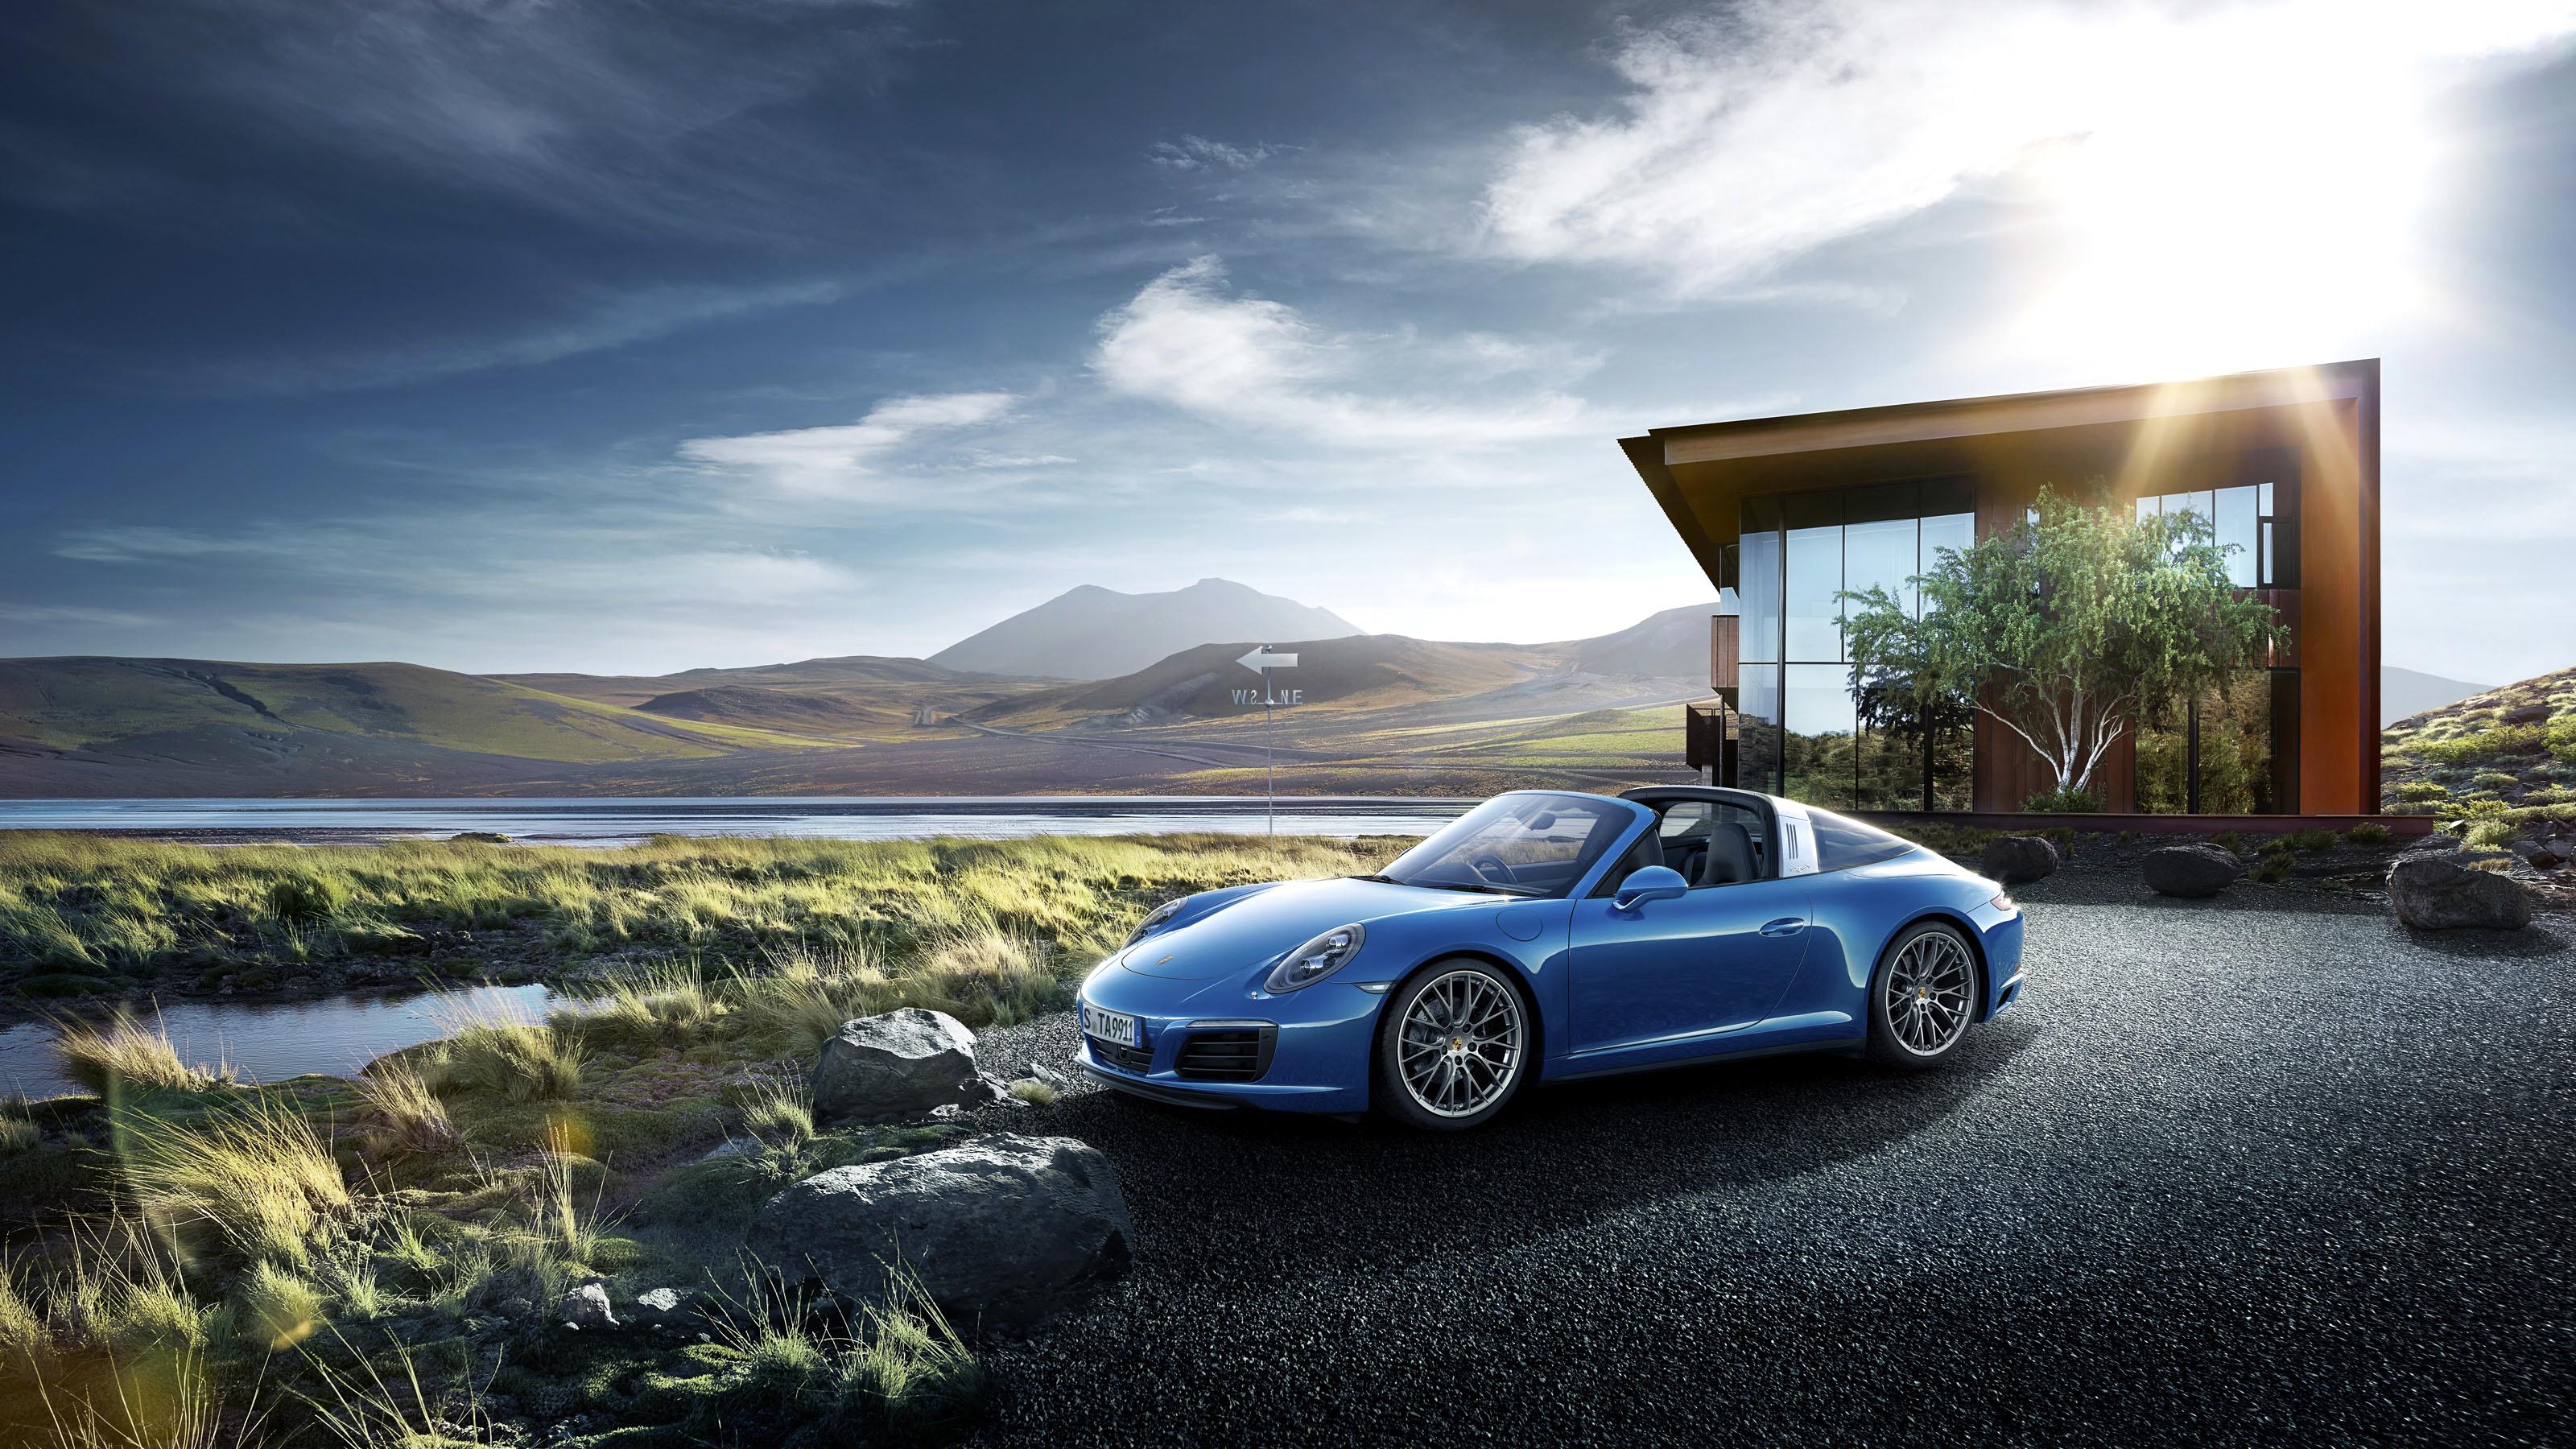 porsche 911 targa hd wallpaper | background image | 3200x1800 | id